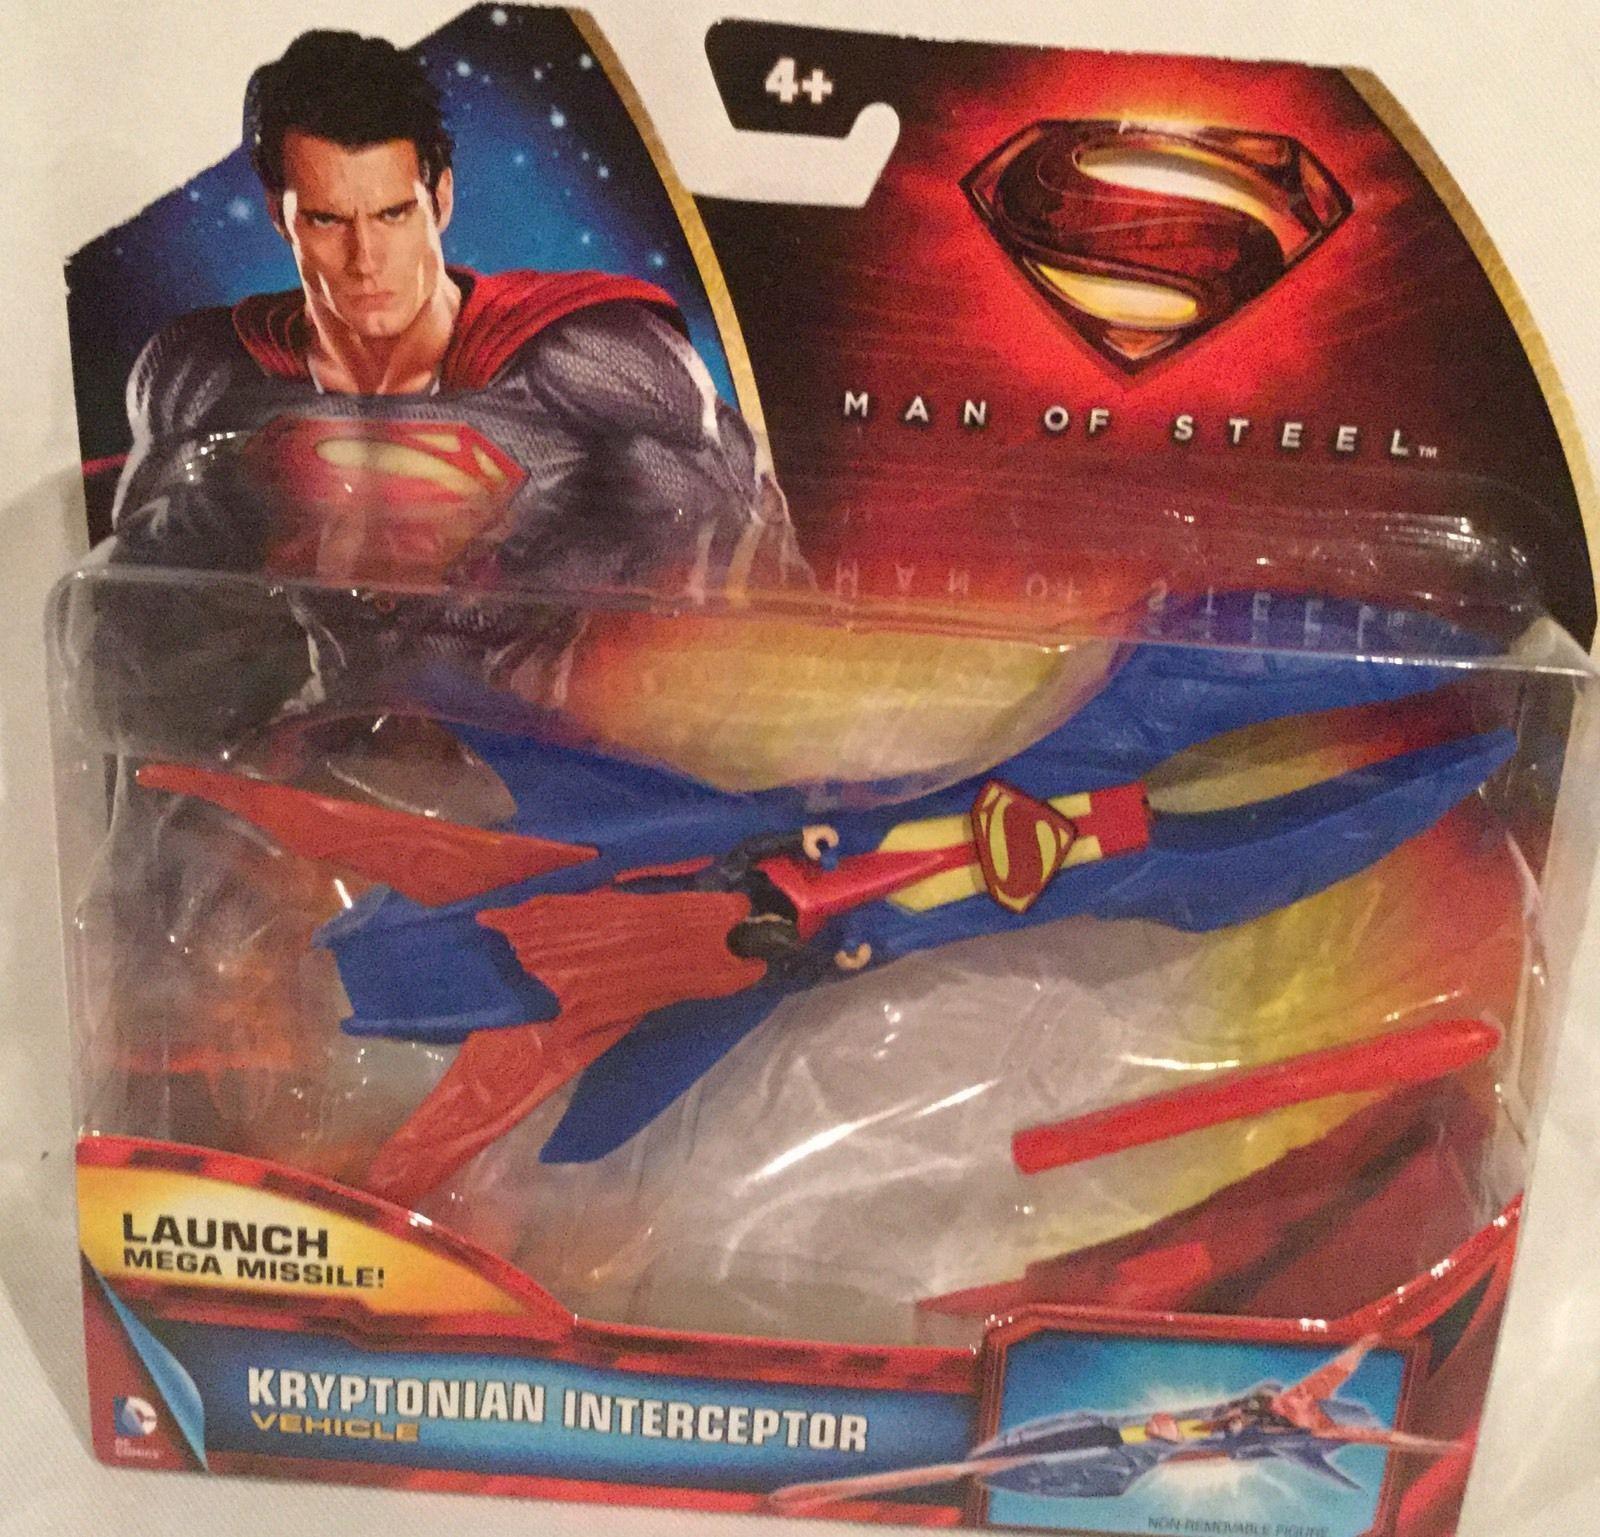 Superman Man of Steel KRYPTONIAN INTERCEPTOR Vehicle & Figure - 2013 - NEW